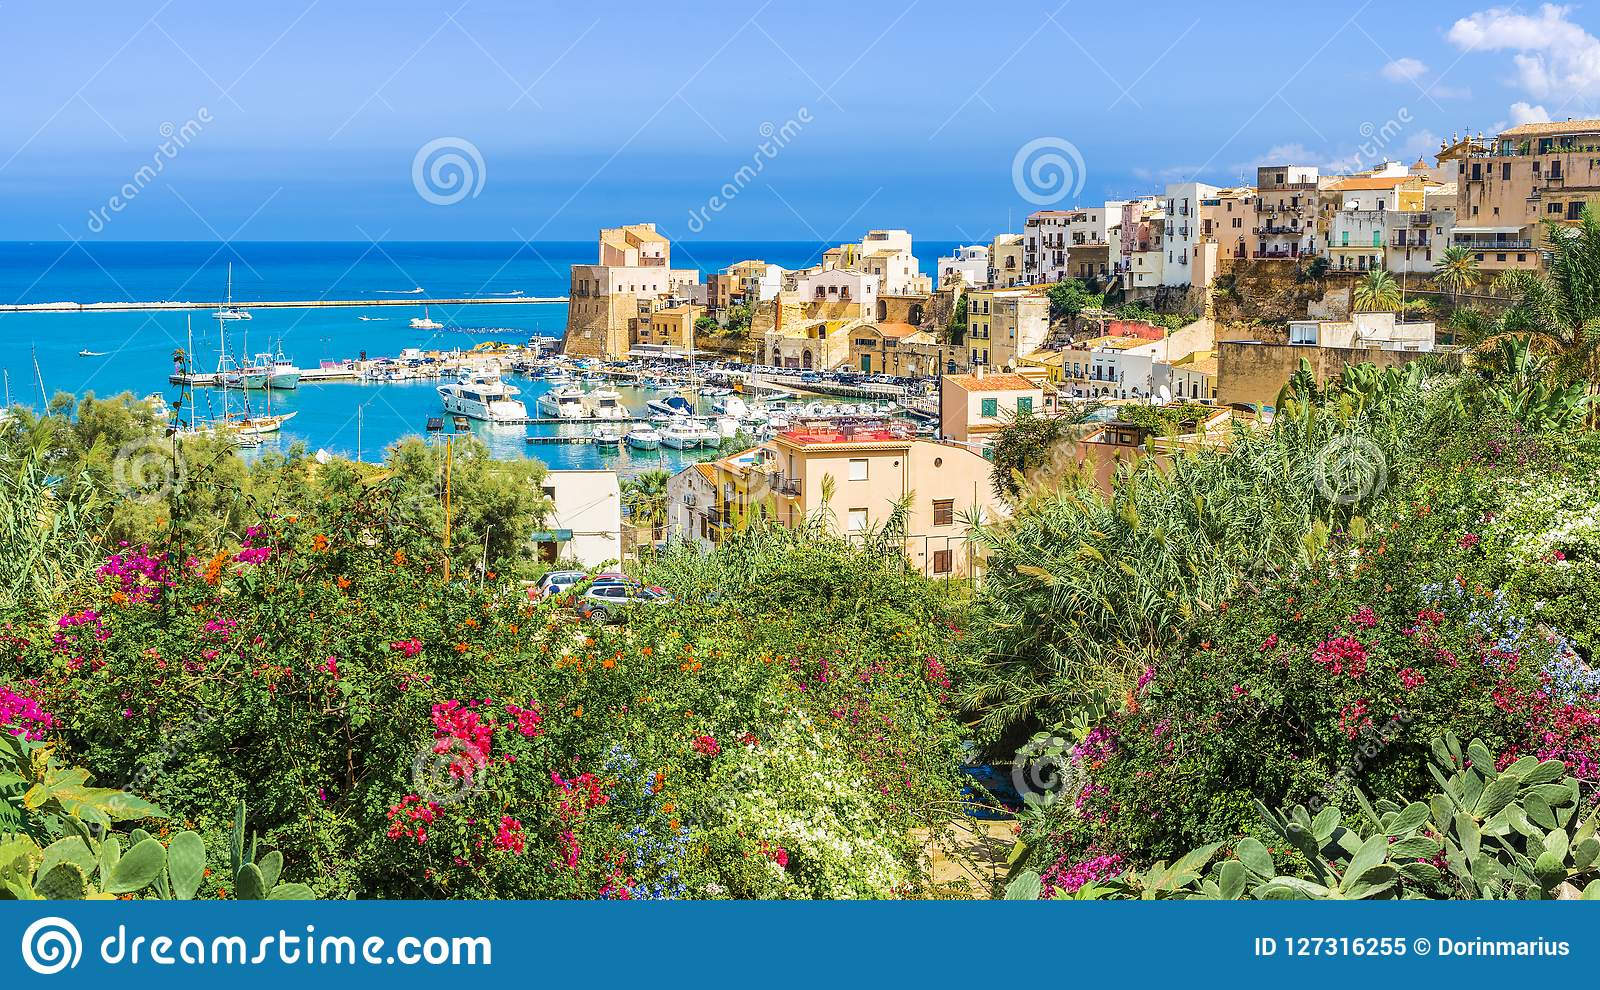 Porto siciliano de Castellammare del Golfo, vila litoral surpreendente da ilha de Sicília, Itália